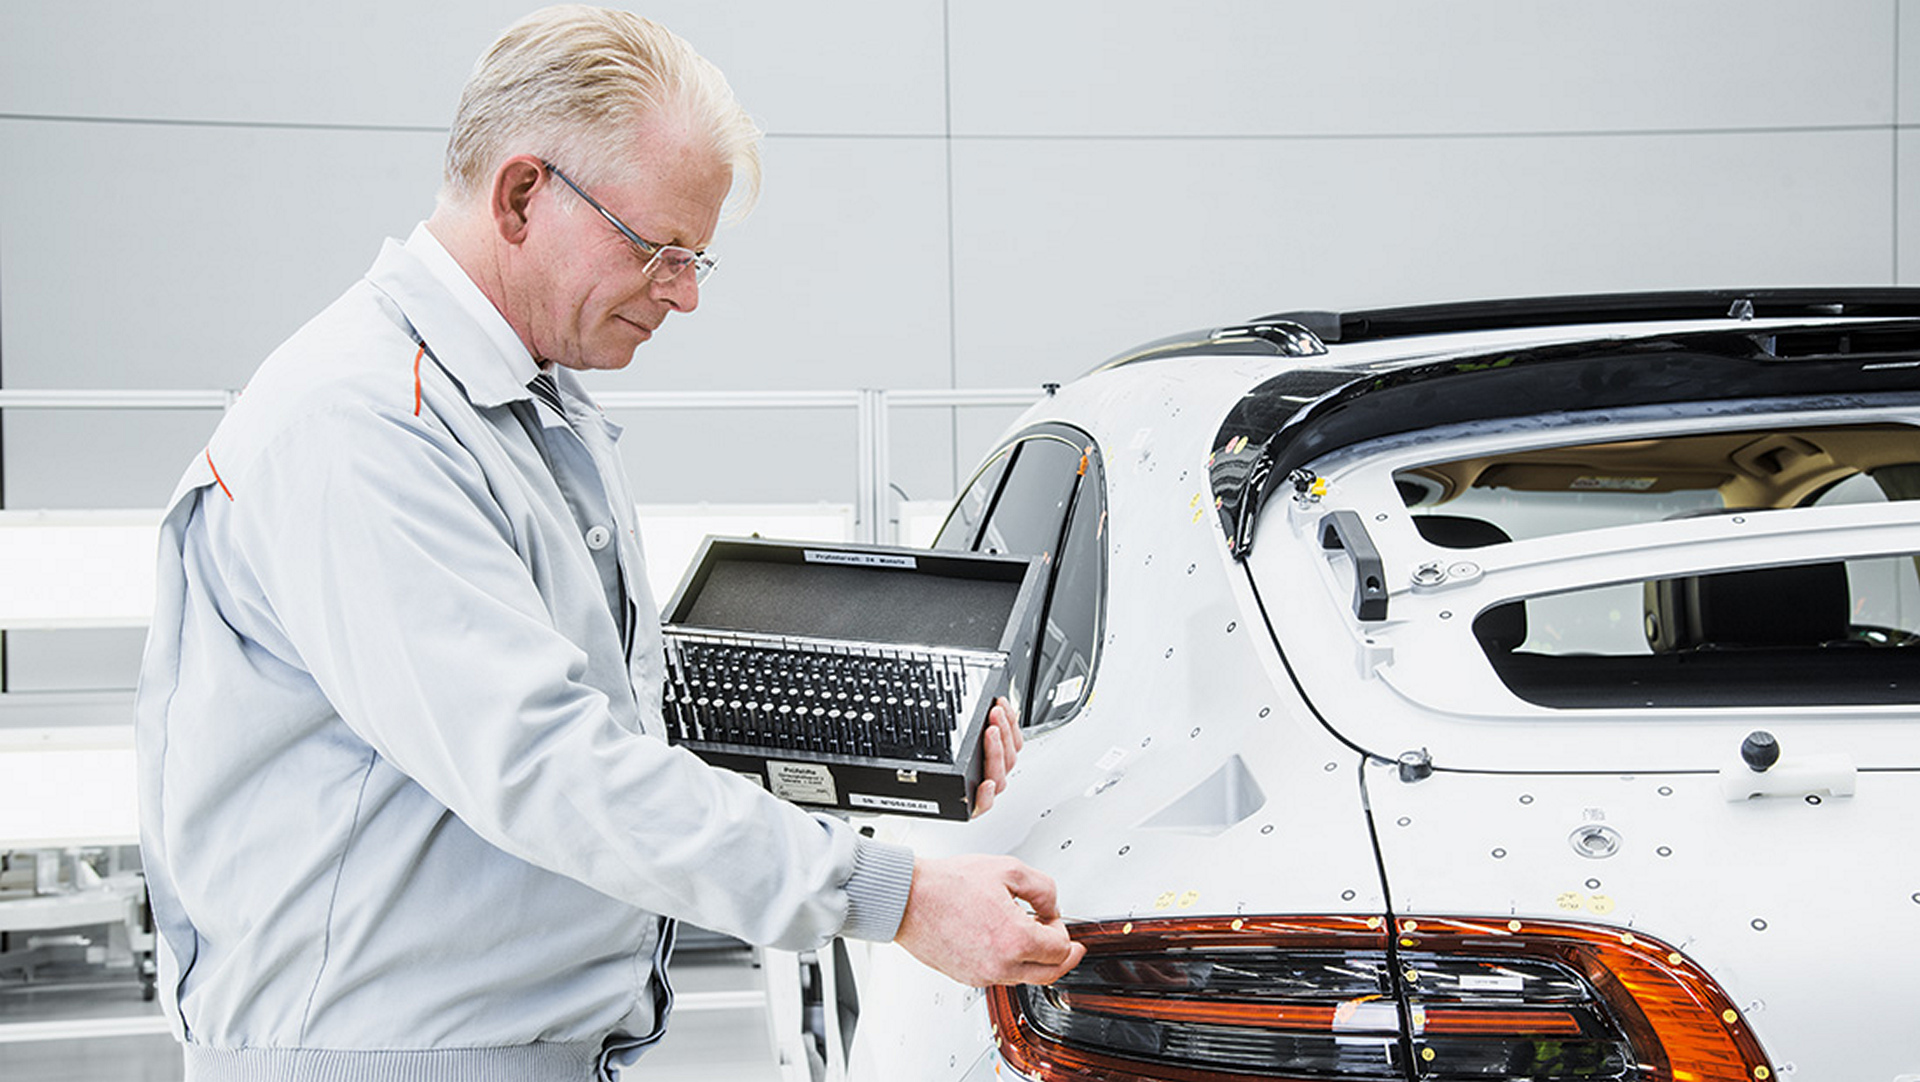 Porsche Macan © Dr. Ing. h.c. F. Porsche AG